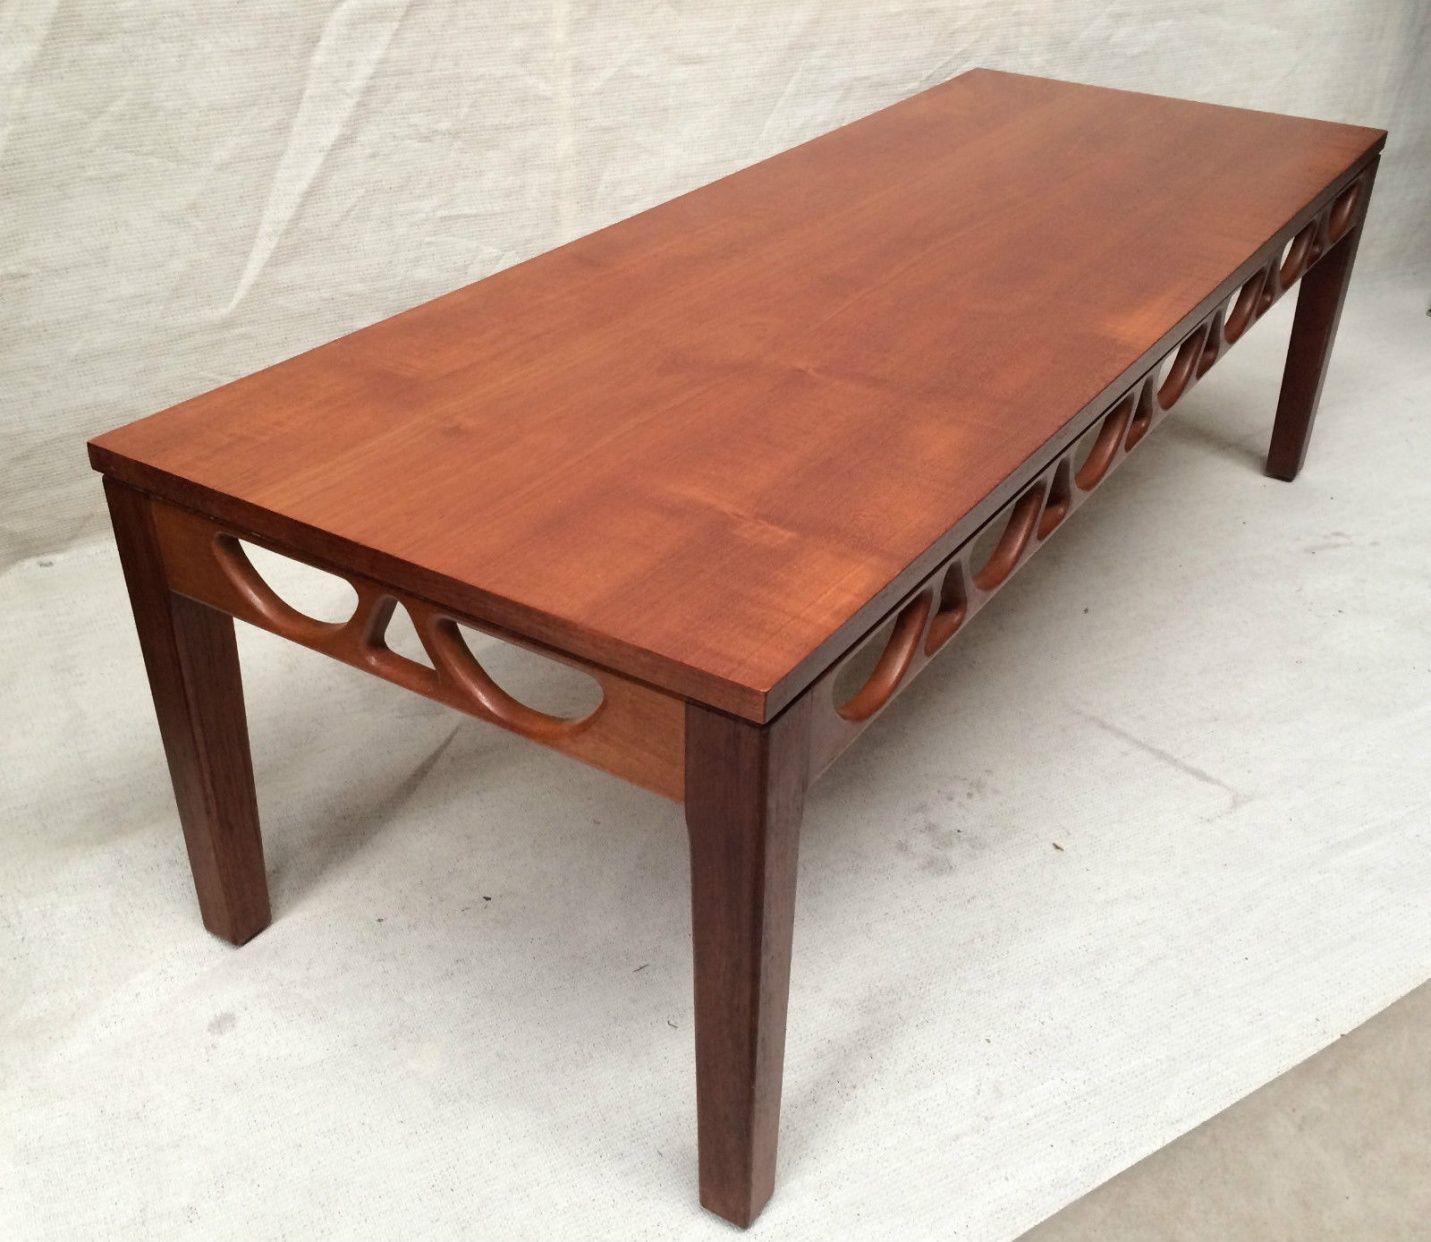 Stunning Teak And Chrome Contemporary Small Coffee Table: Stunning Genuine 60s AVALON TEAK COFFEE TABLE MID CENTURY